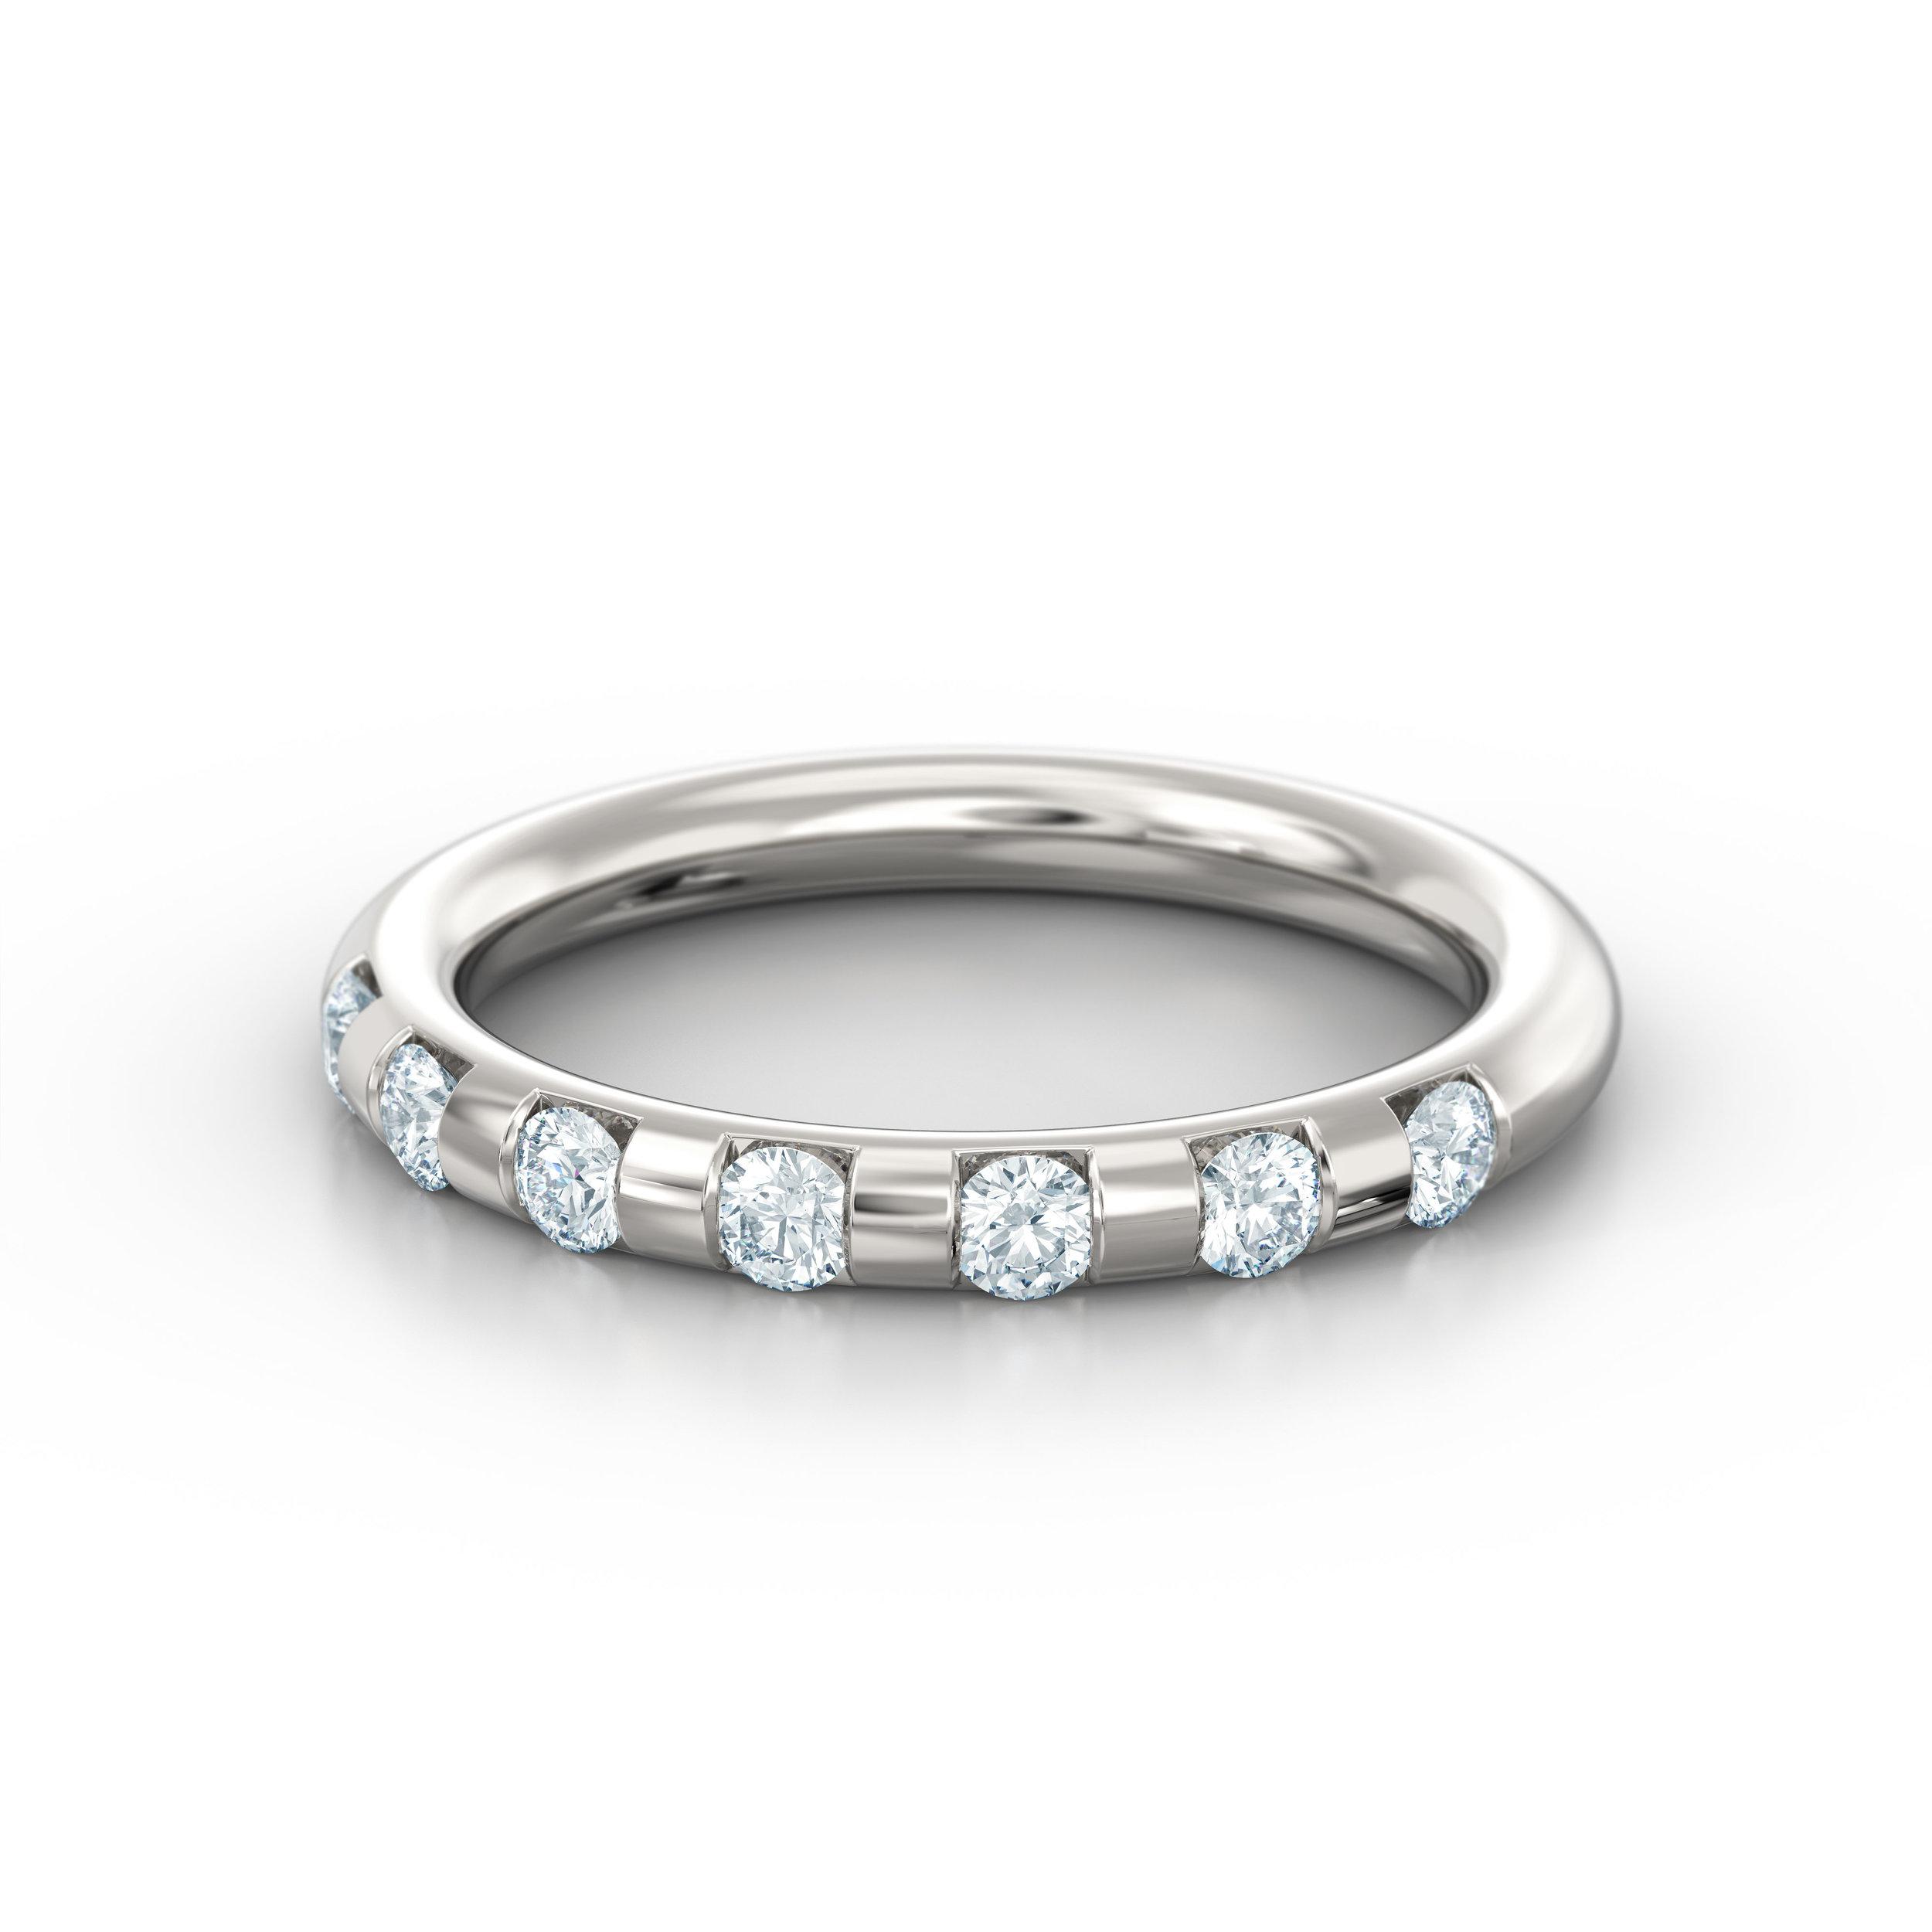 Brilliant cut off-set diamond eternity ring